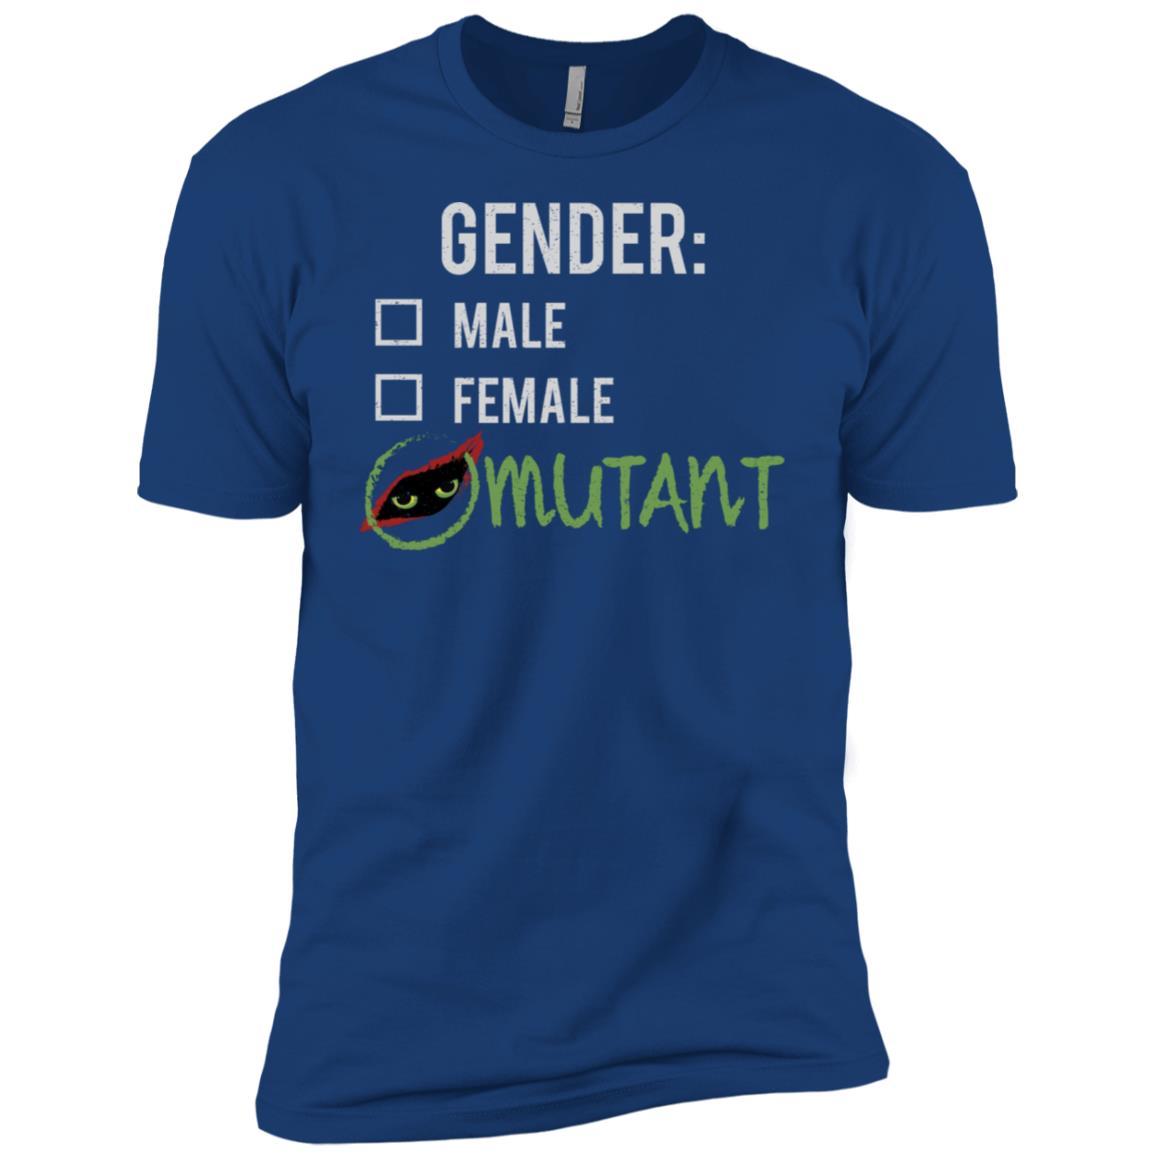 Male Female Mutant Gender Nonbinary Trans Men Short Sleeve T-Shirt